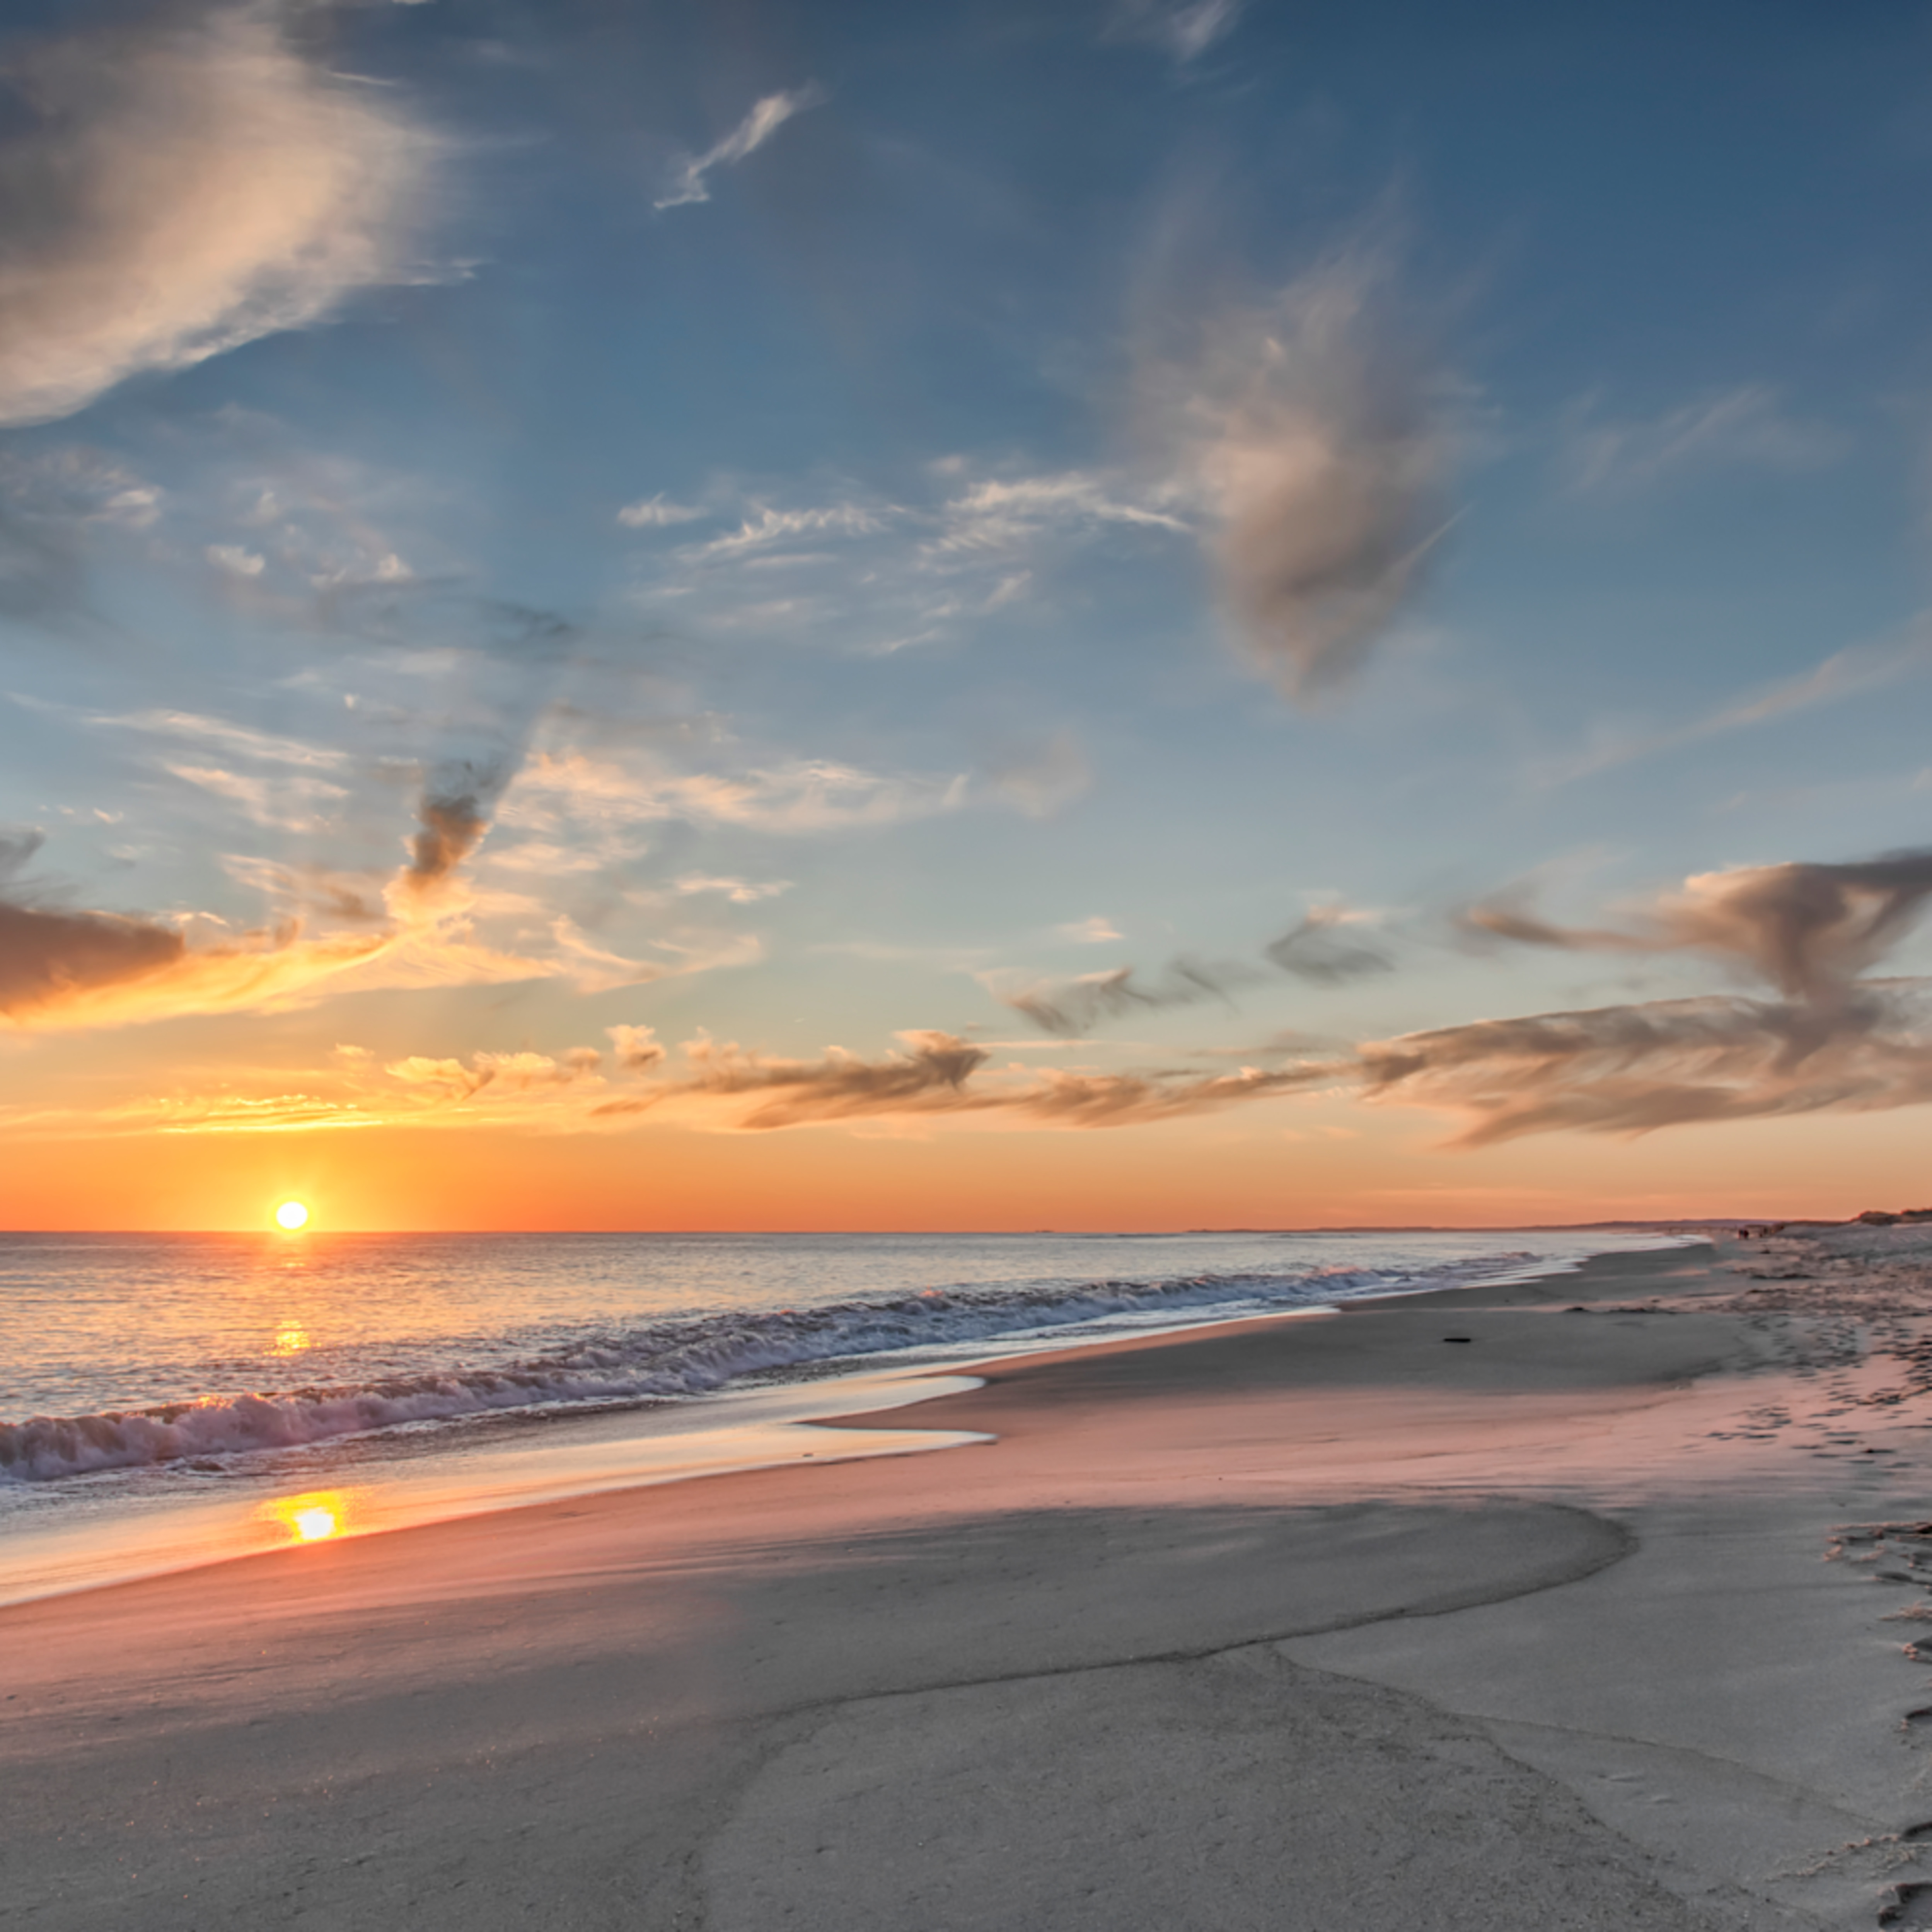 South beach sand and clouds 1 nk9erj